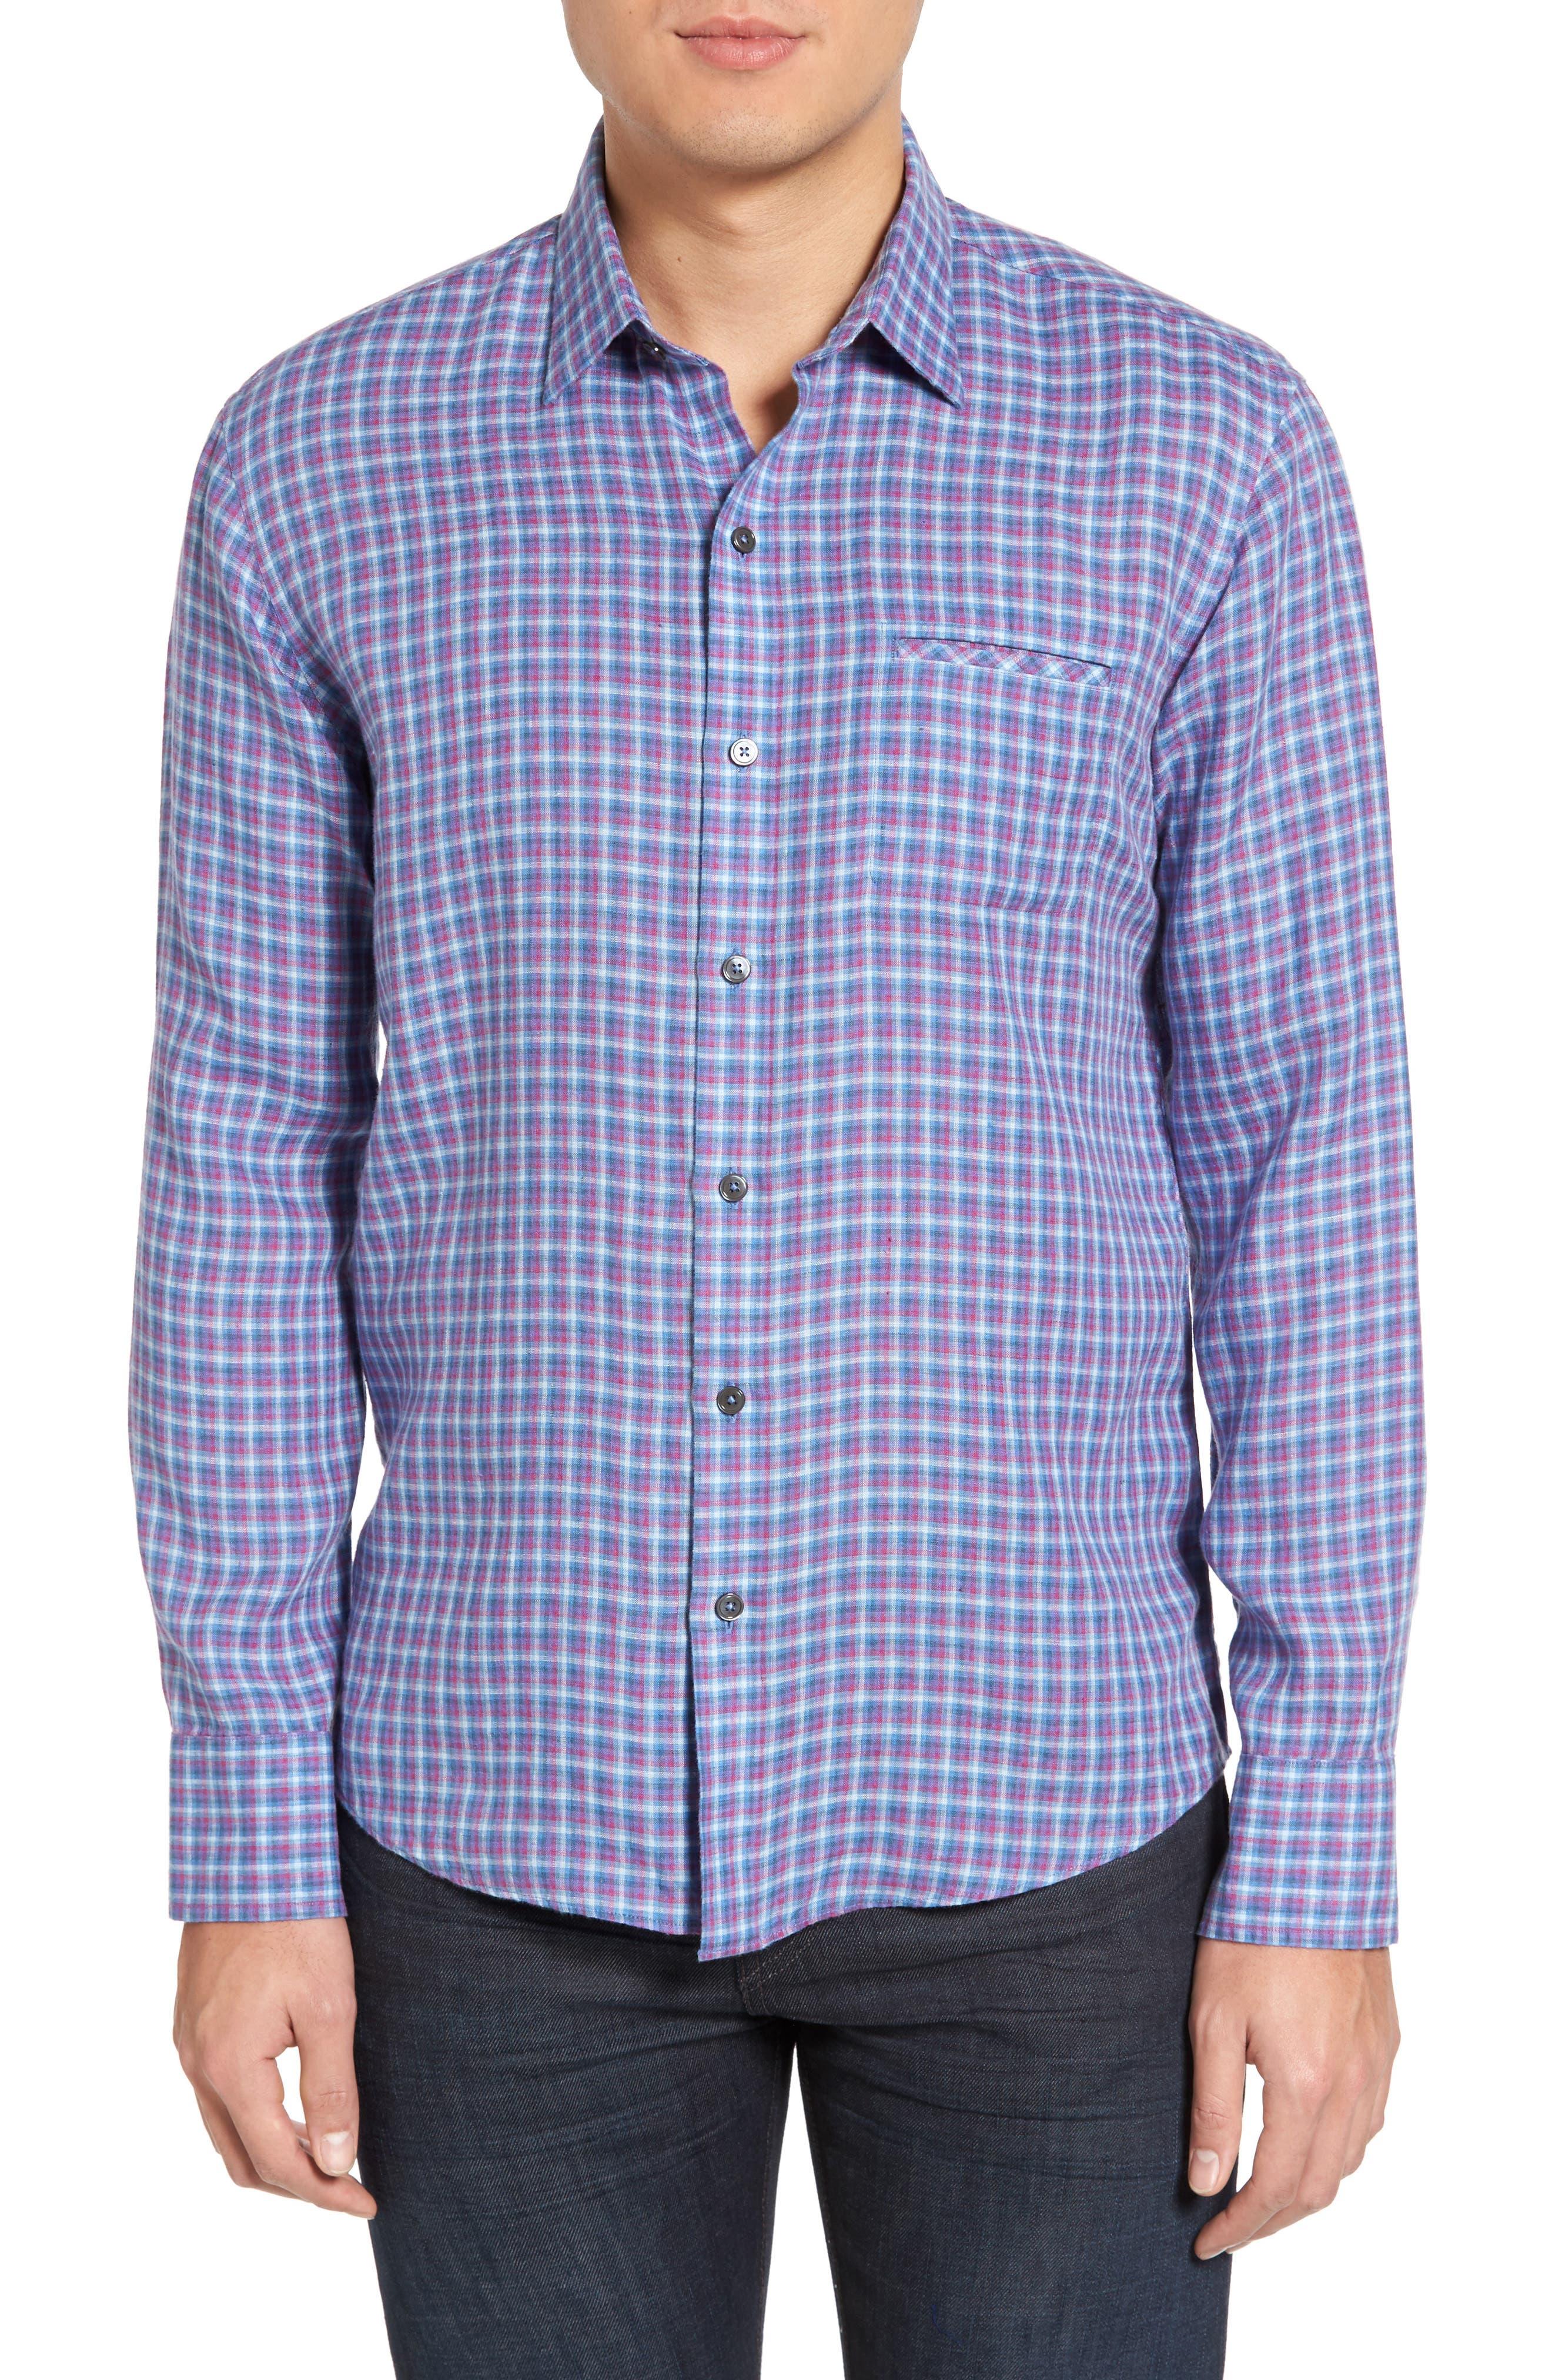 ZACHARY PRELL, Althoff Regular Fit Plaid Linen Sport Shirt, Main thumbnail 1, color, AZURE